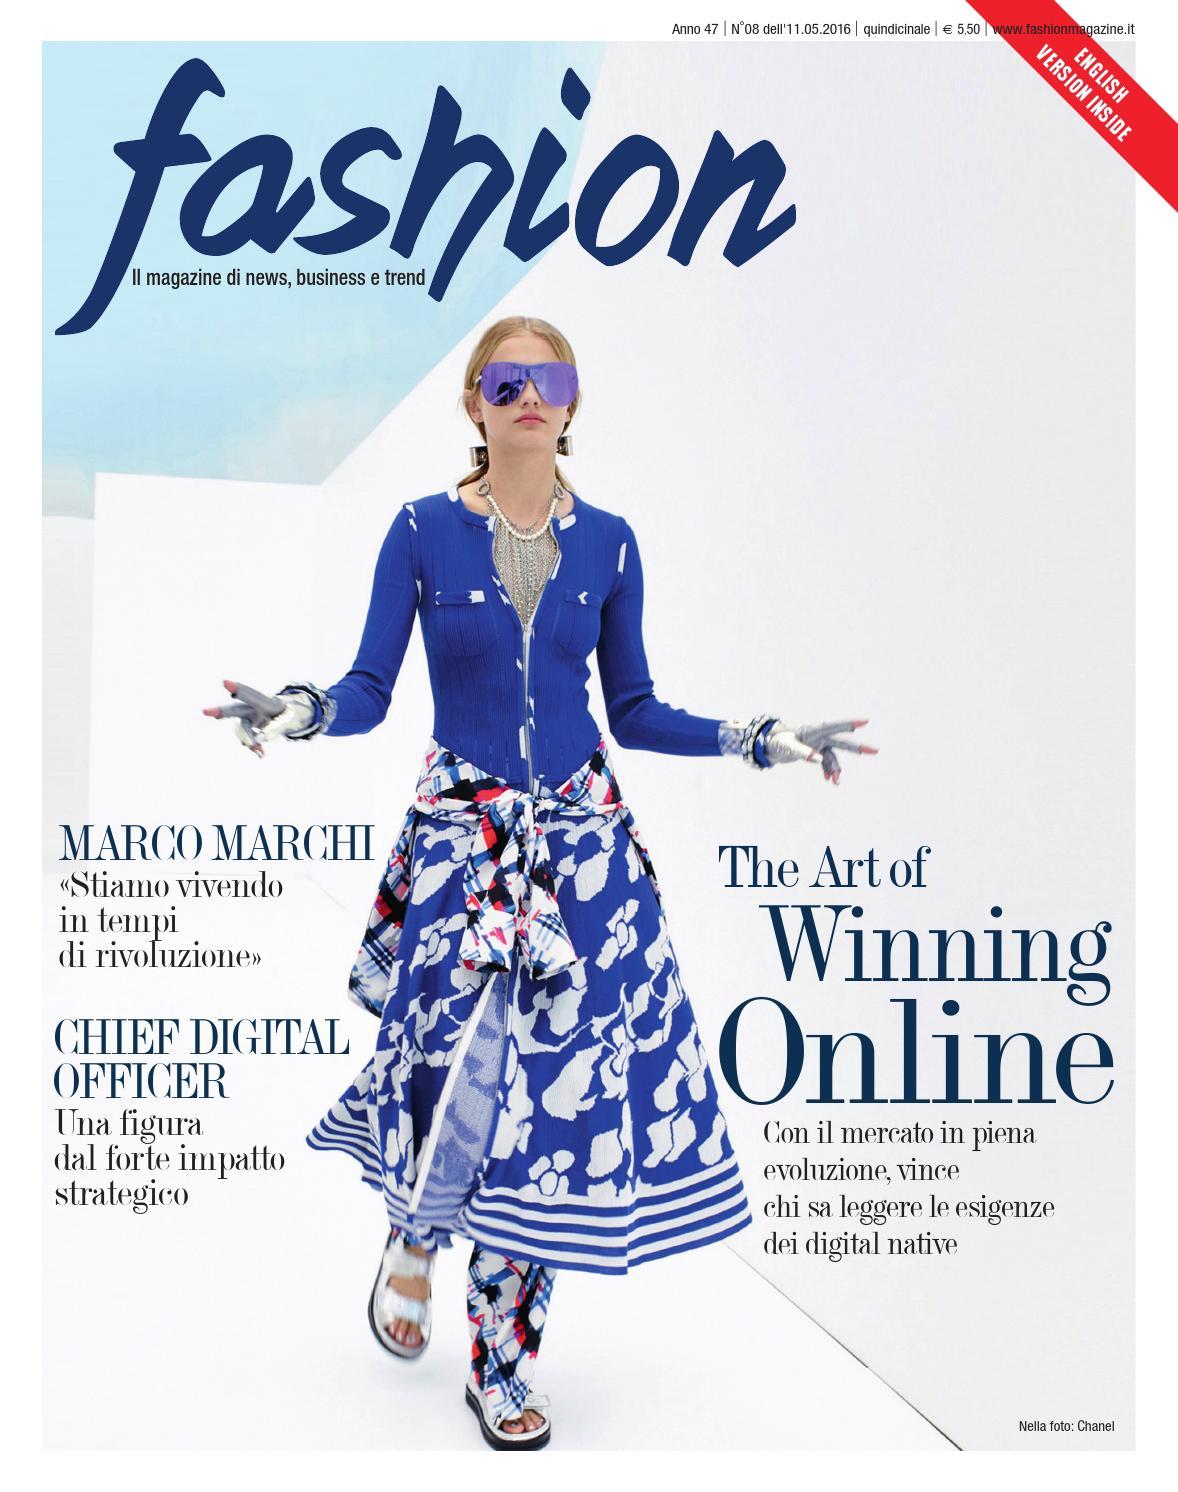 Altri Siti Come Dalani flip page fa n 8 2016 by fashionmagazine - issuu